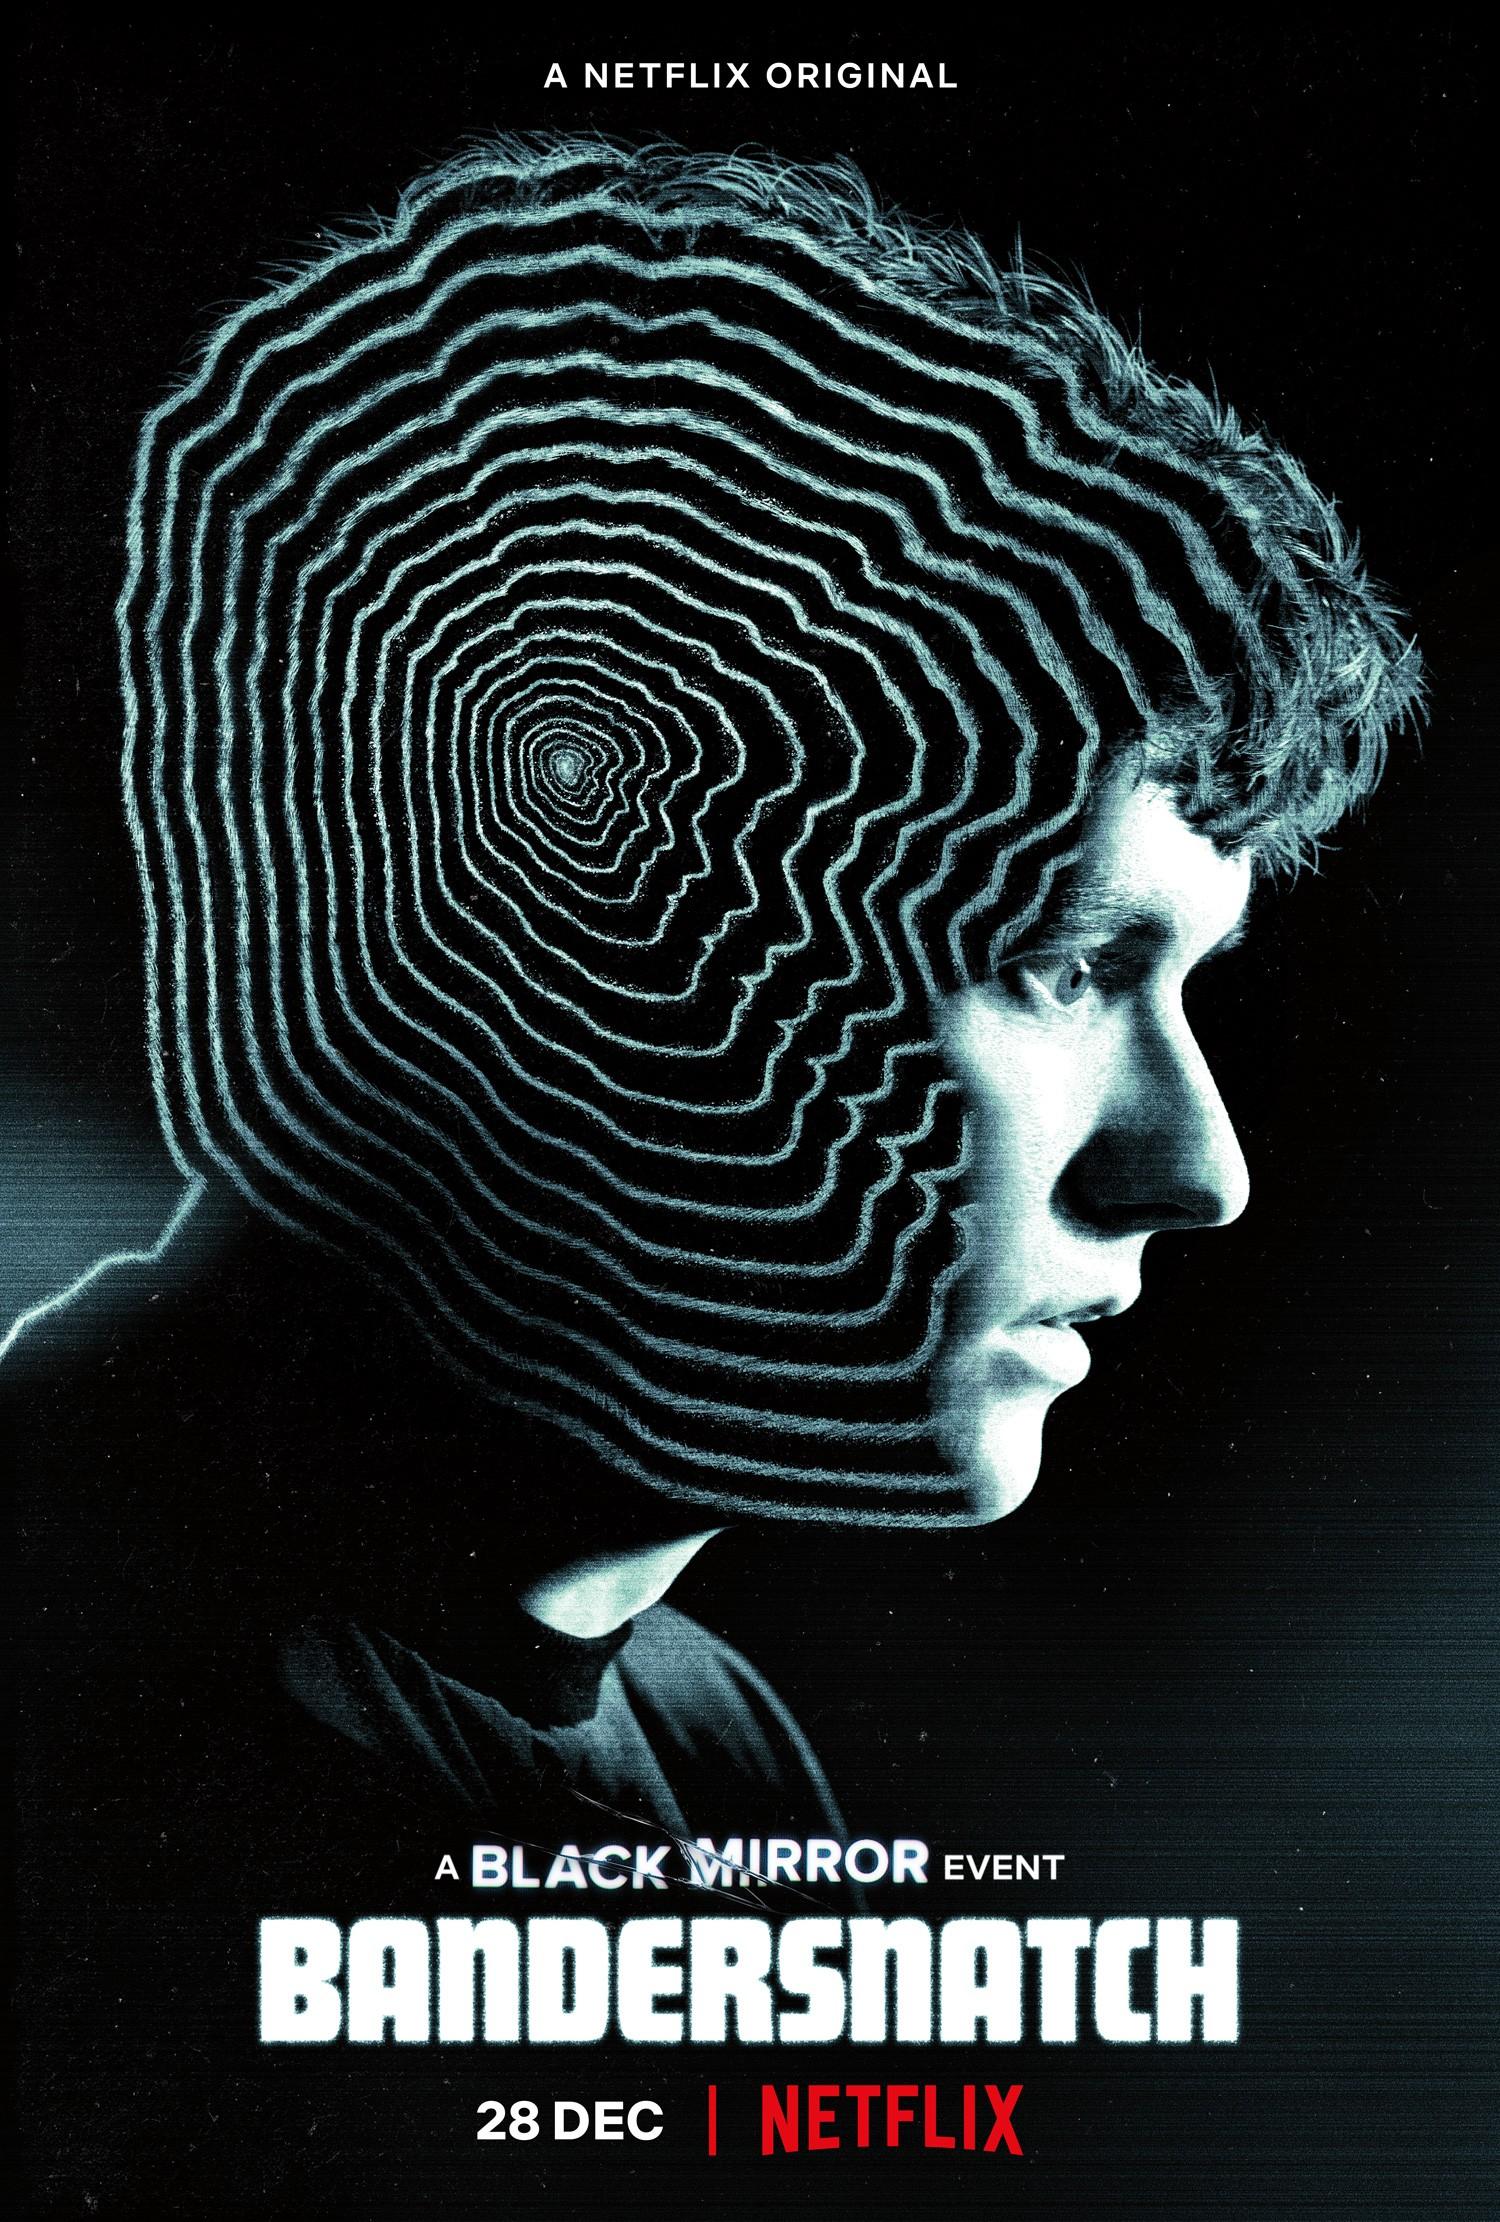 Stefan (Fionn Whitehead) em Black Mirror: Bandersnatch (Foto: Divulgação)